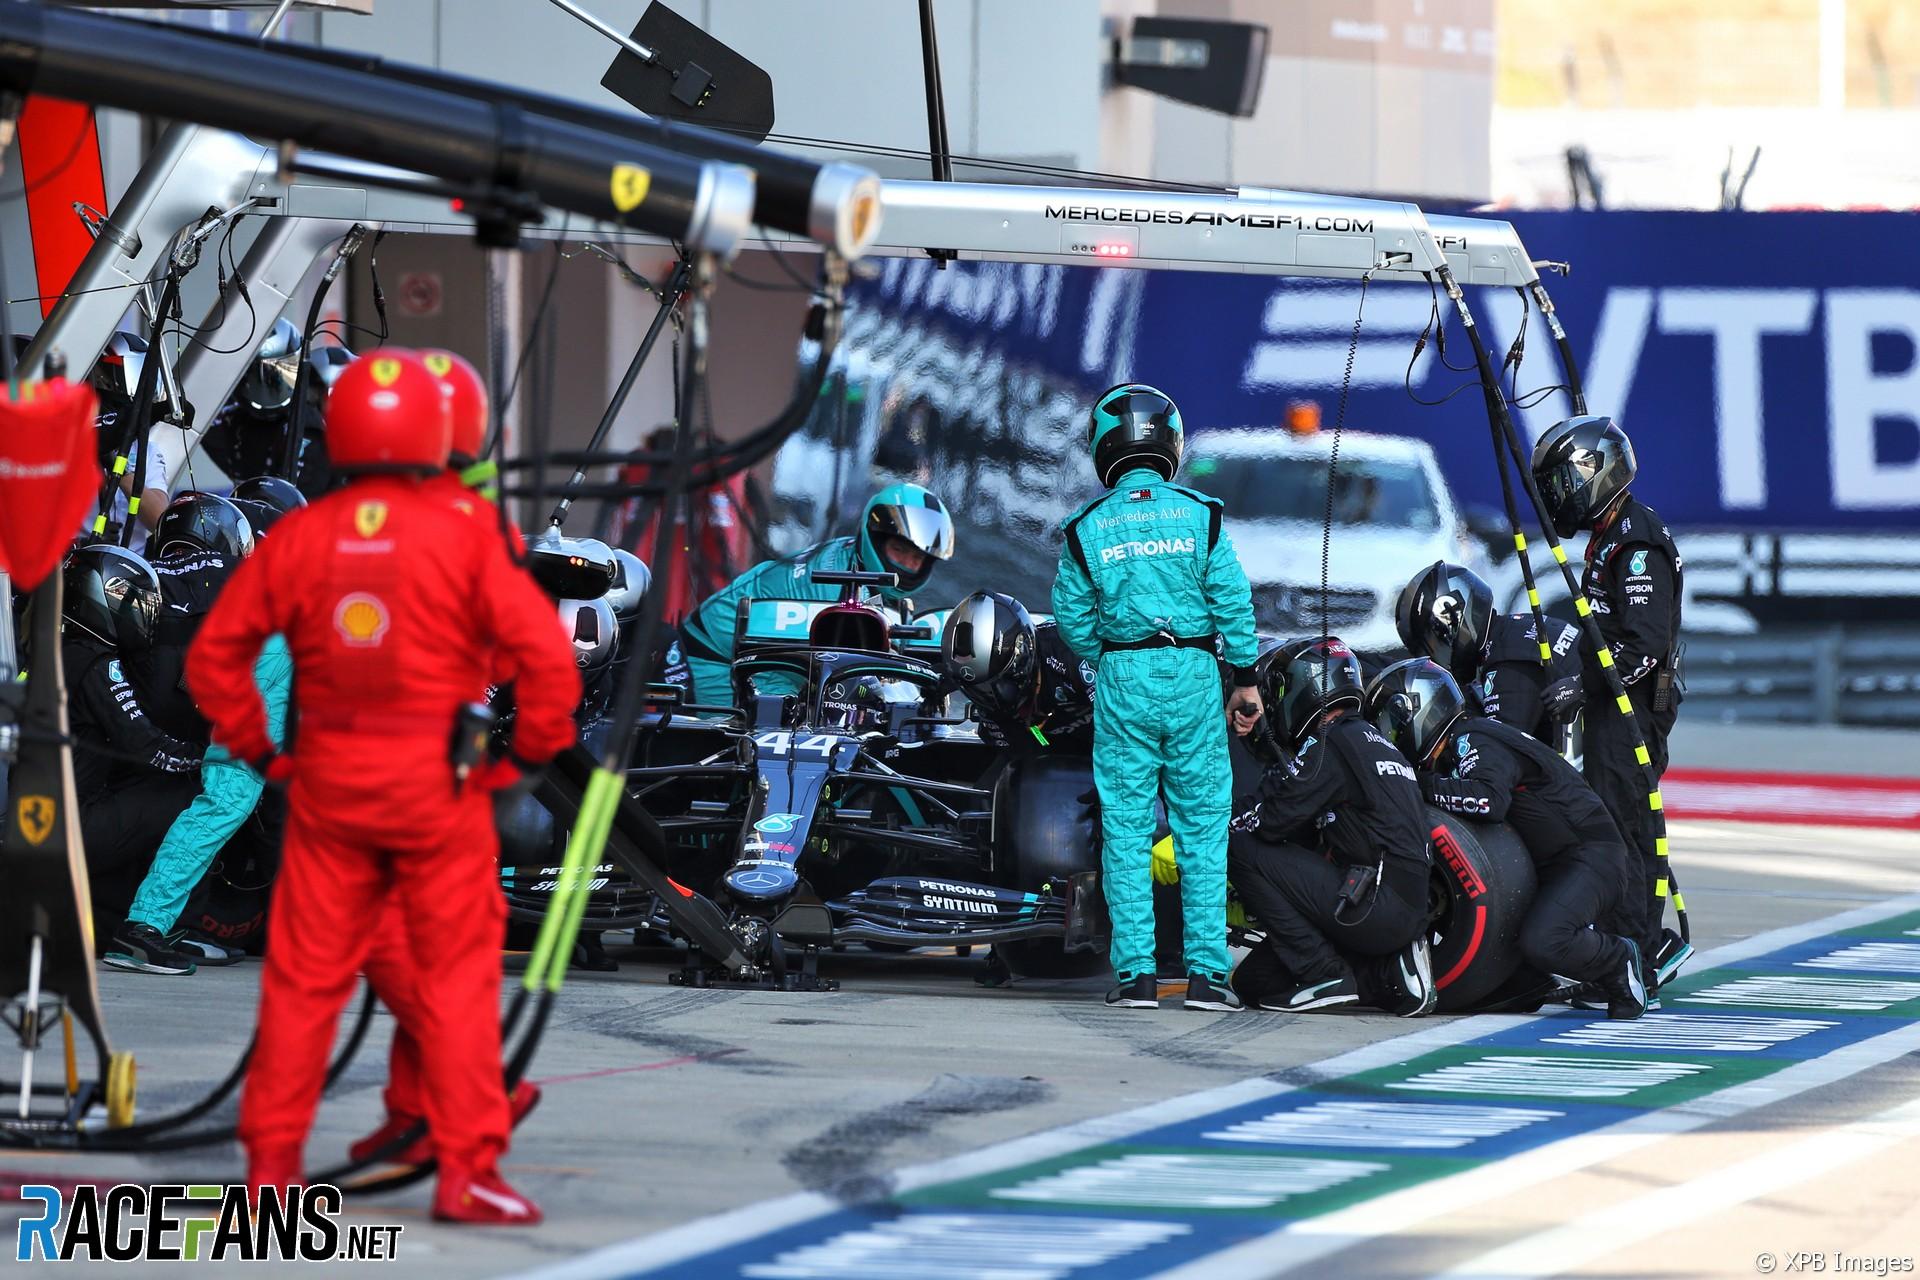 Lewis Hamilton, Mercedes, Sochi Autodrom, 2020